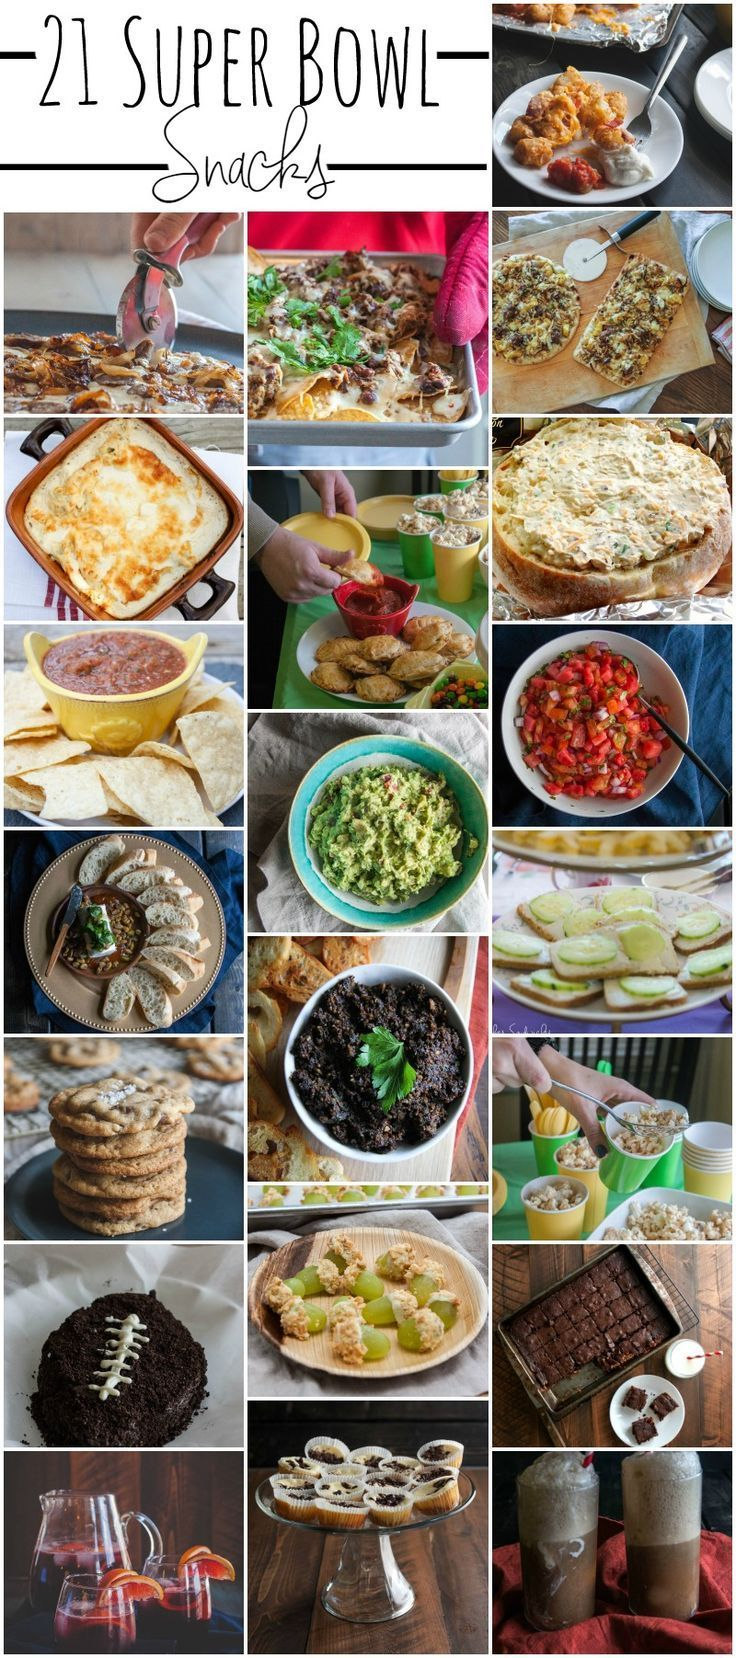 21 super bowl snack & appetizer ideas | pinterest | snacks, bowls